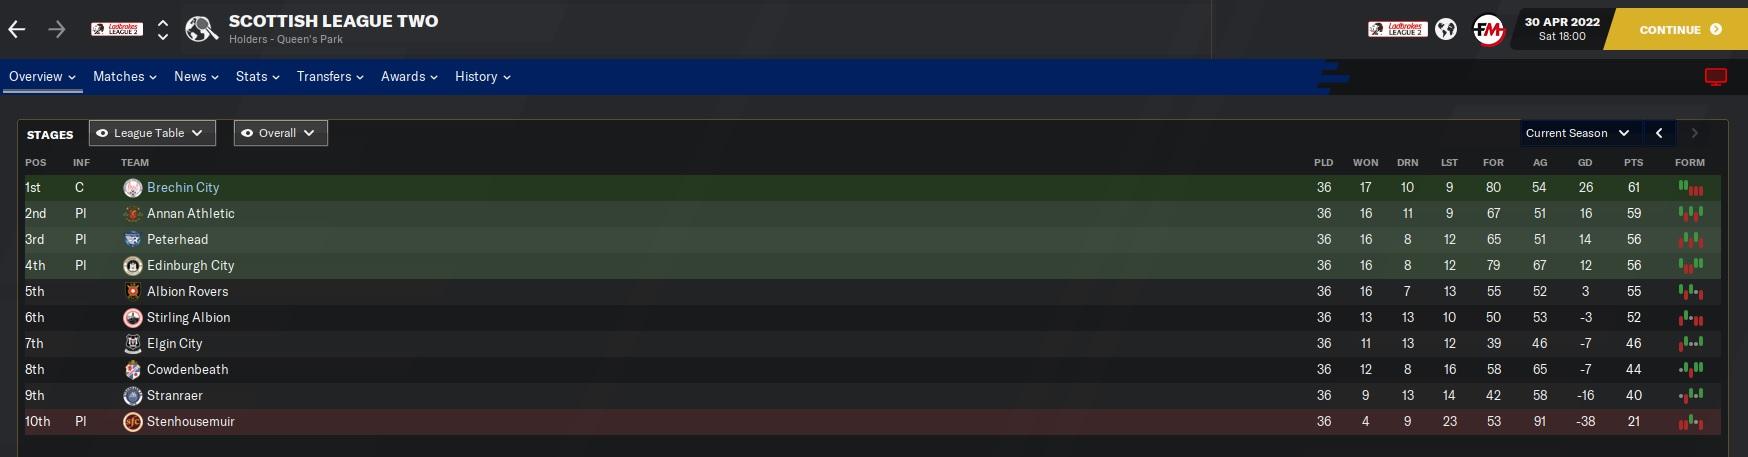 league final.jpg